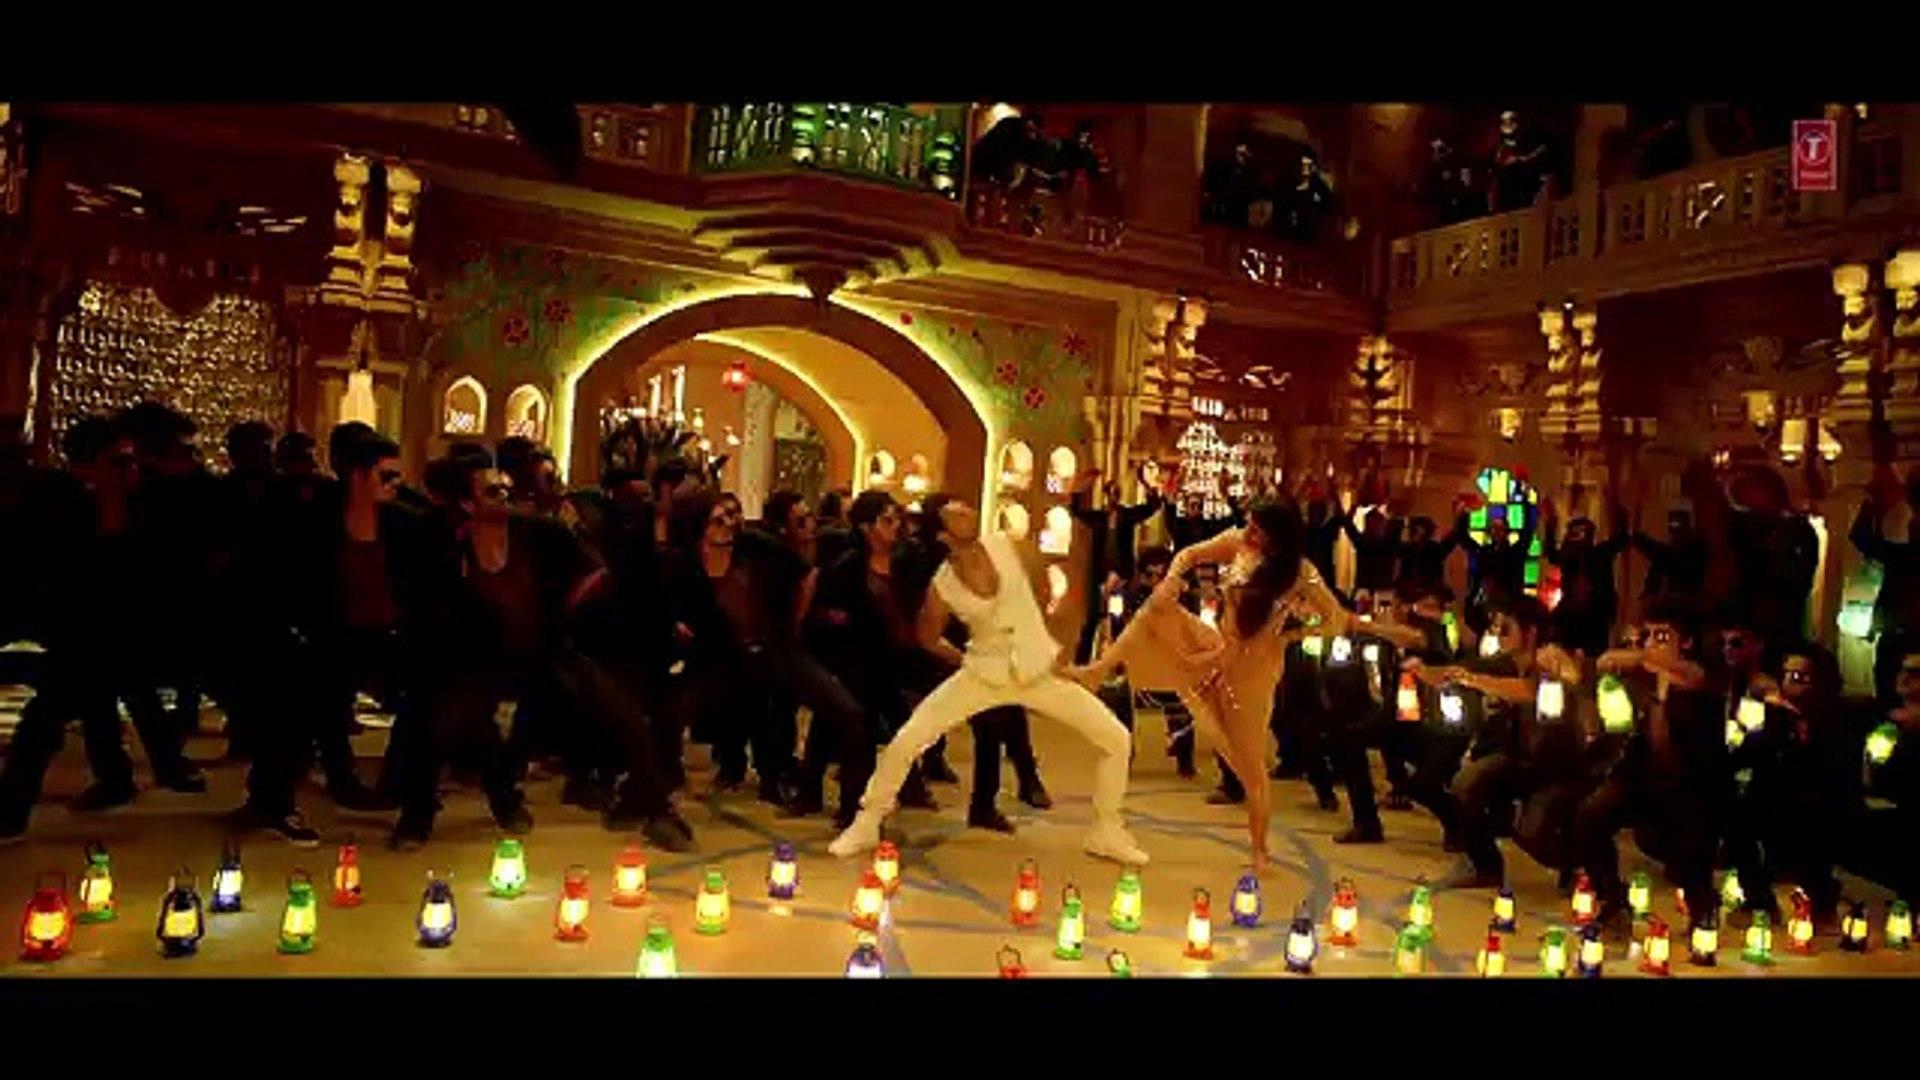 Bulbul' FULL VIDEO Song HD VIDEO SONG | _ Hey Bro _|  Shreya Ghoshal, Feat. Himesh Reshammiya _